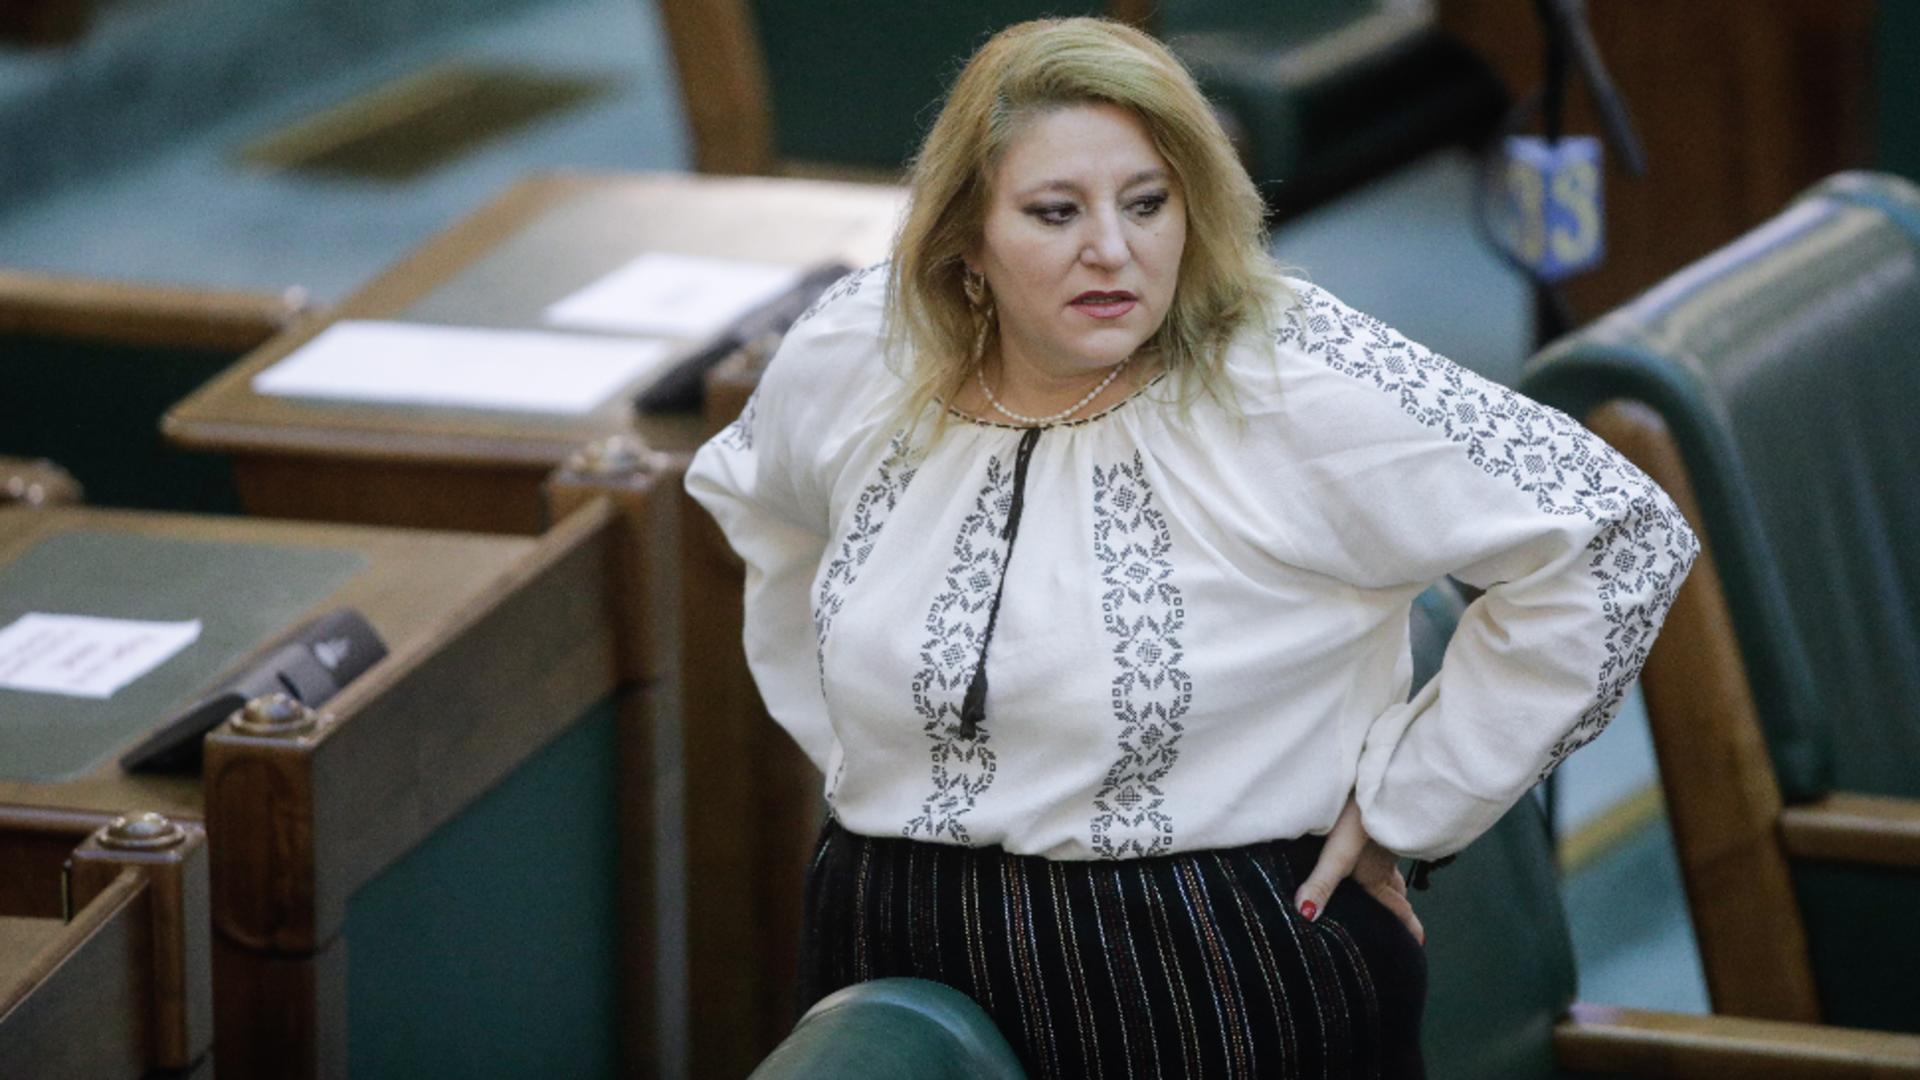 Diana Șoșoacă, senator independent (AUR) Foto: Inquam Photos/George Călin